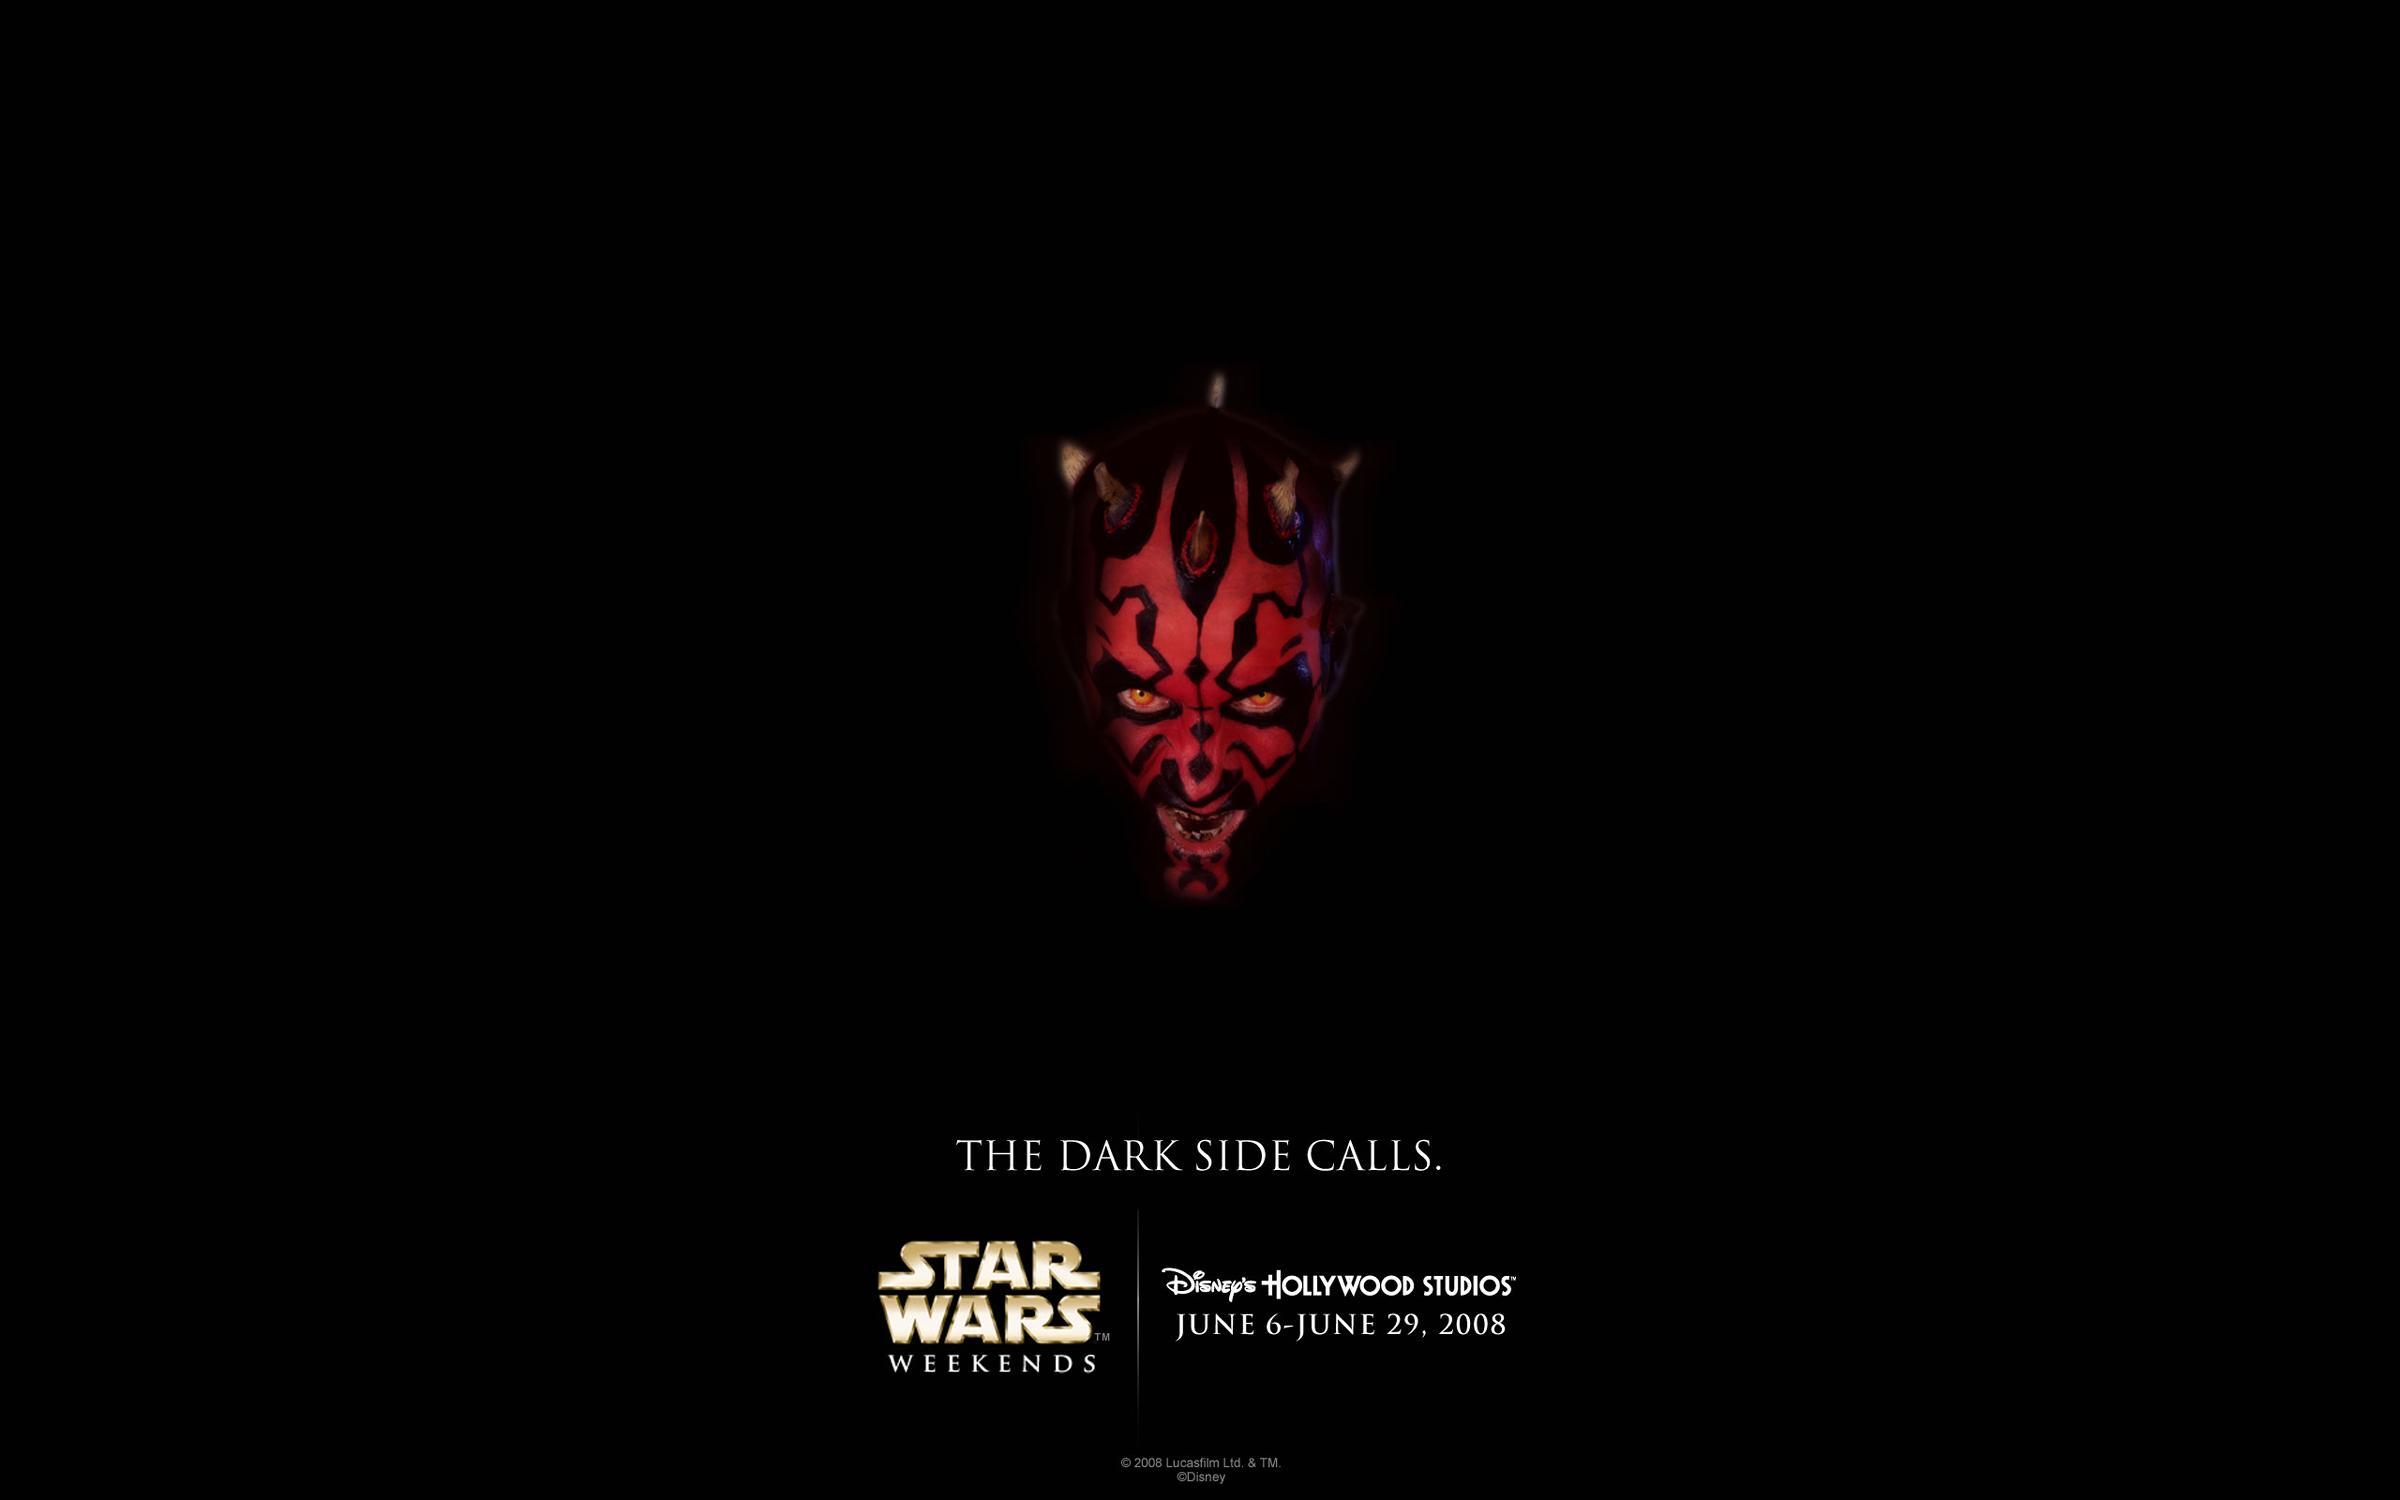 Star Wars Hd Wallpaper Background Image 2400x1500 Id 251704